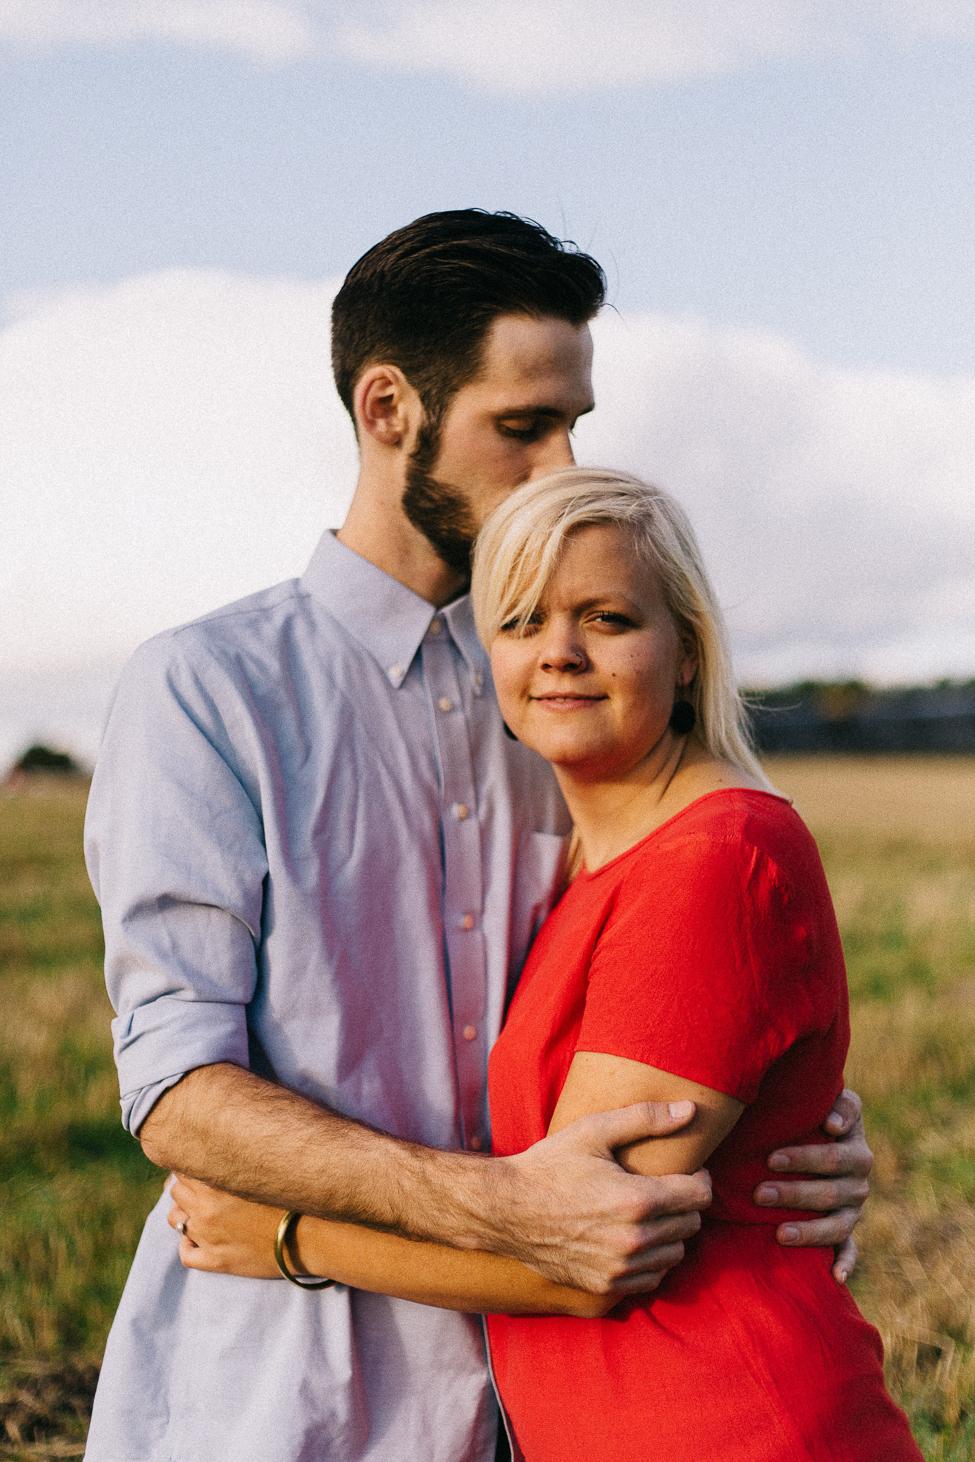 Beautiful, rad couple in Denmark.